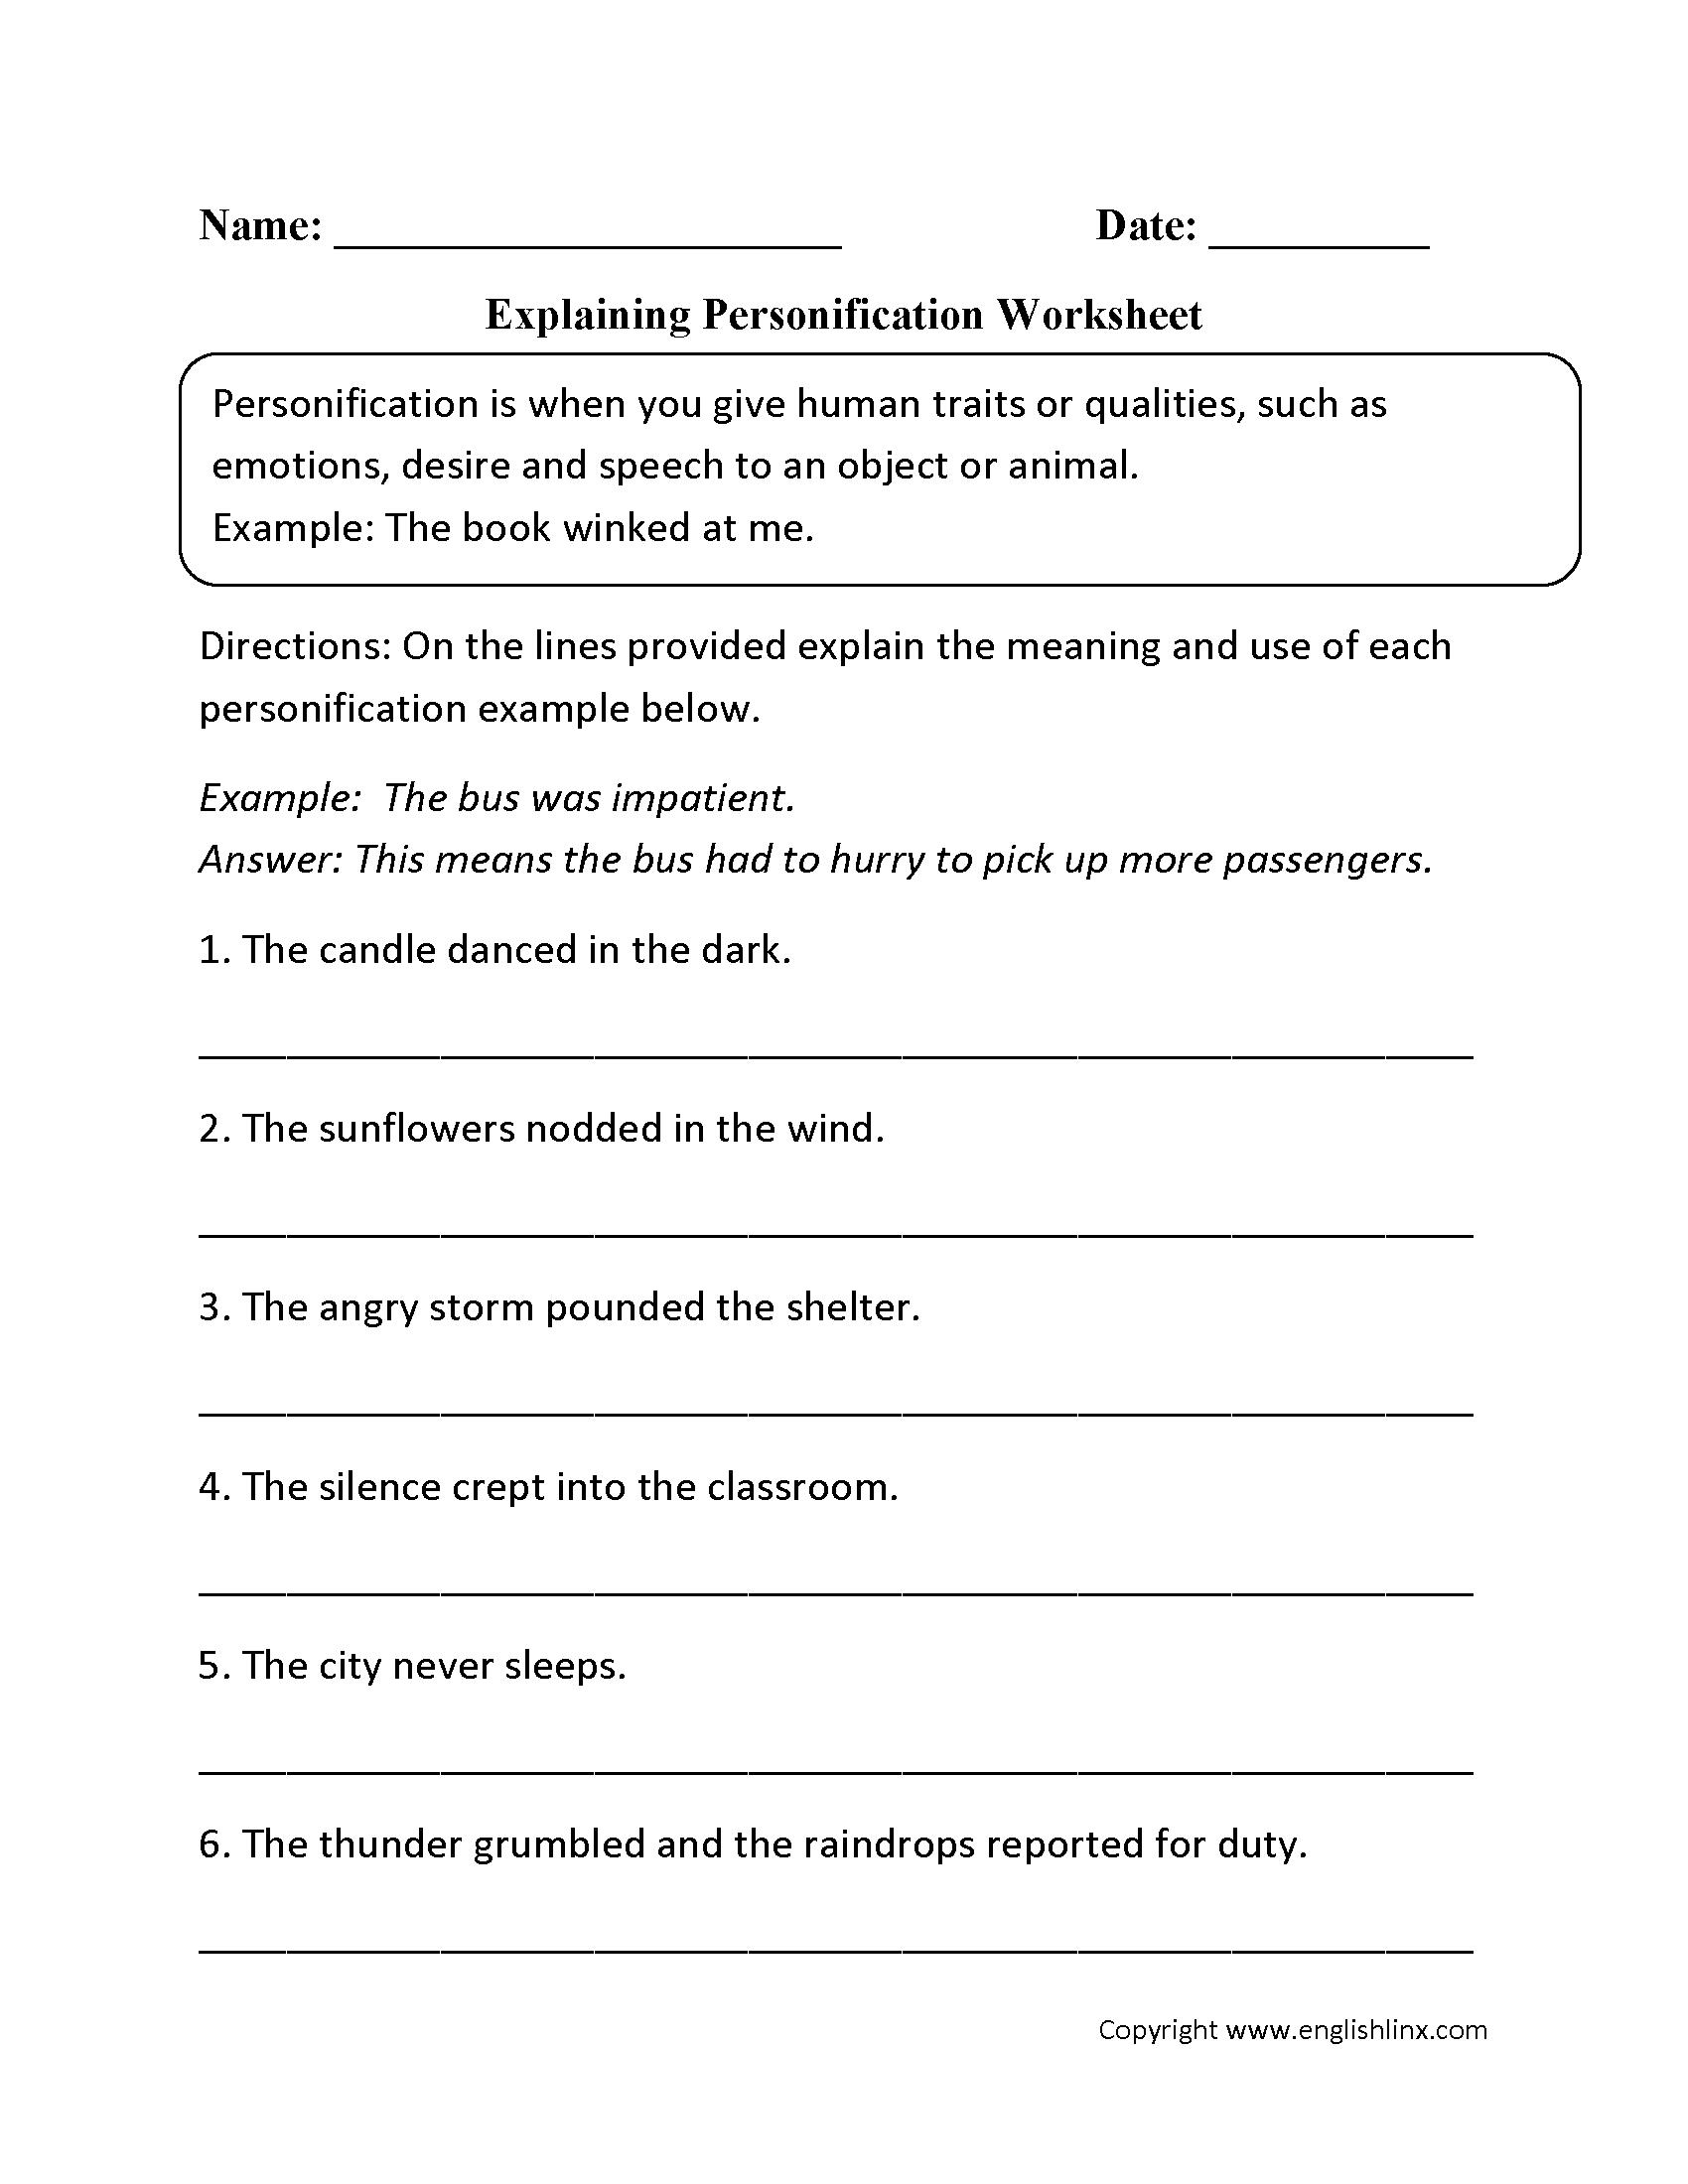 Worksheets Metaphor Worksheet comparing in metaphors worksheet english metaphore pinterest worksheets language arts and language